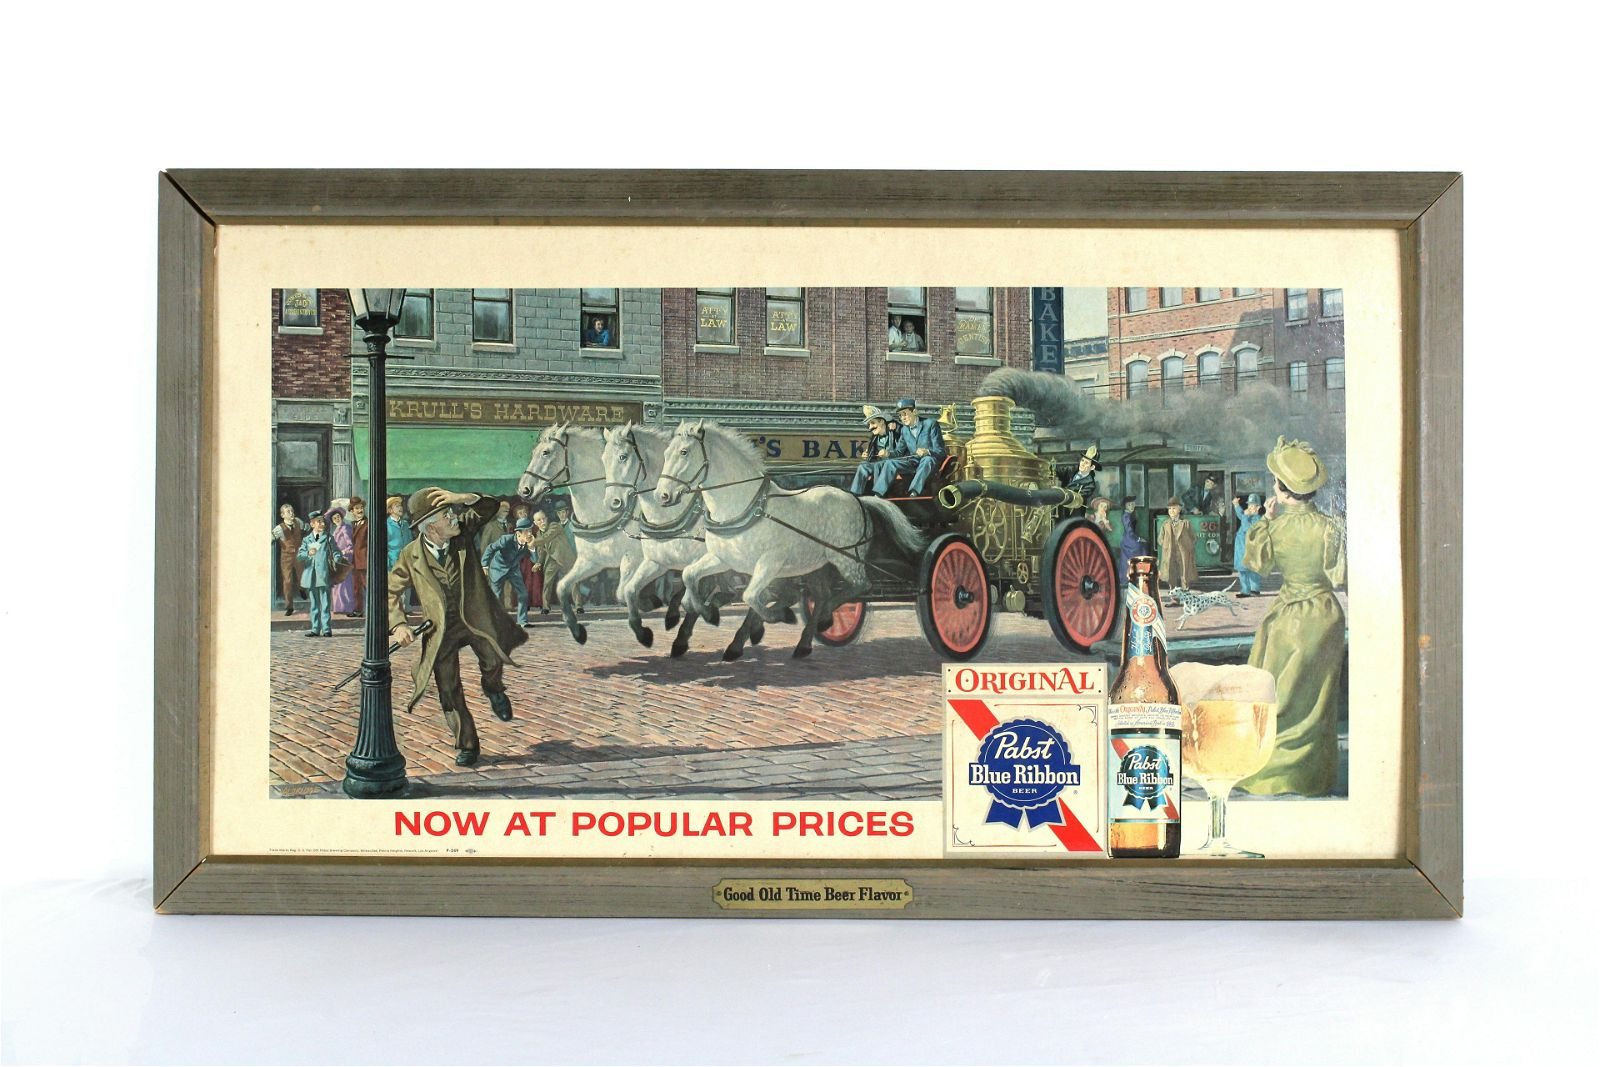 PBR, Pabst Blue Ribbon Cardboard Advertisement in Frame